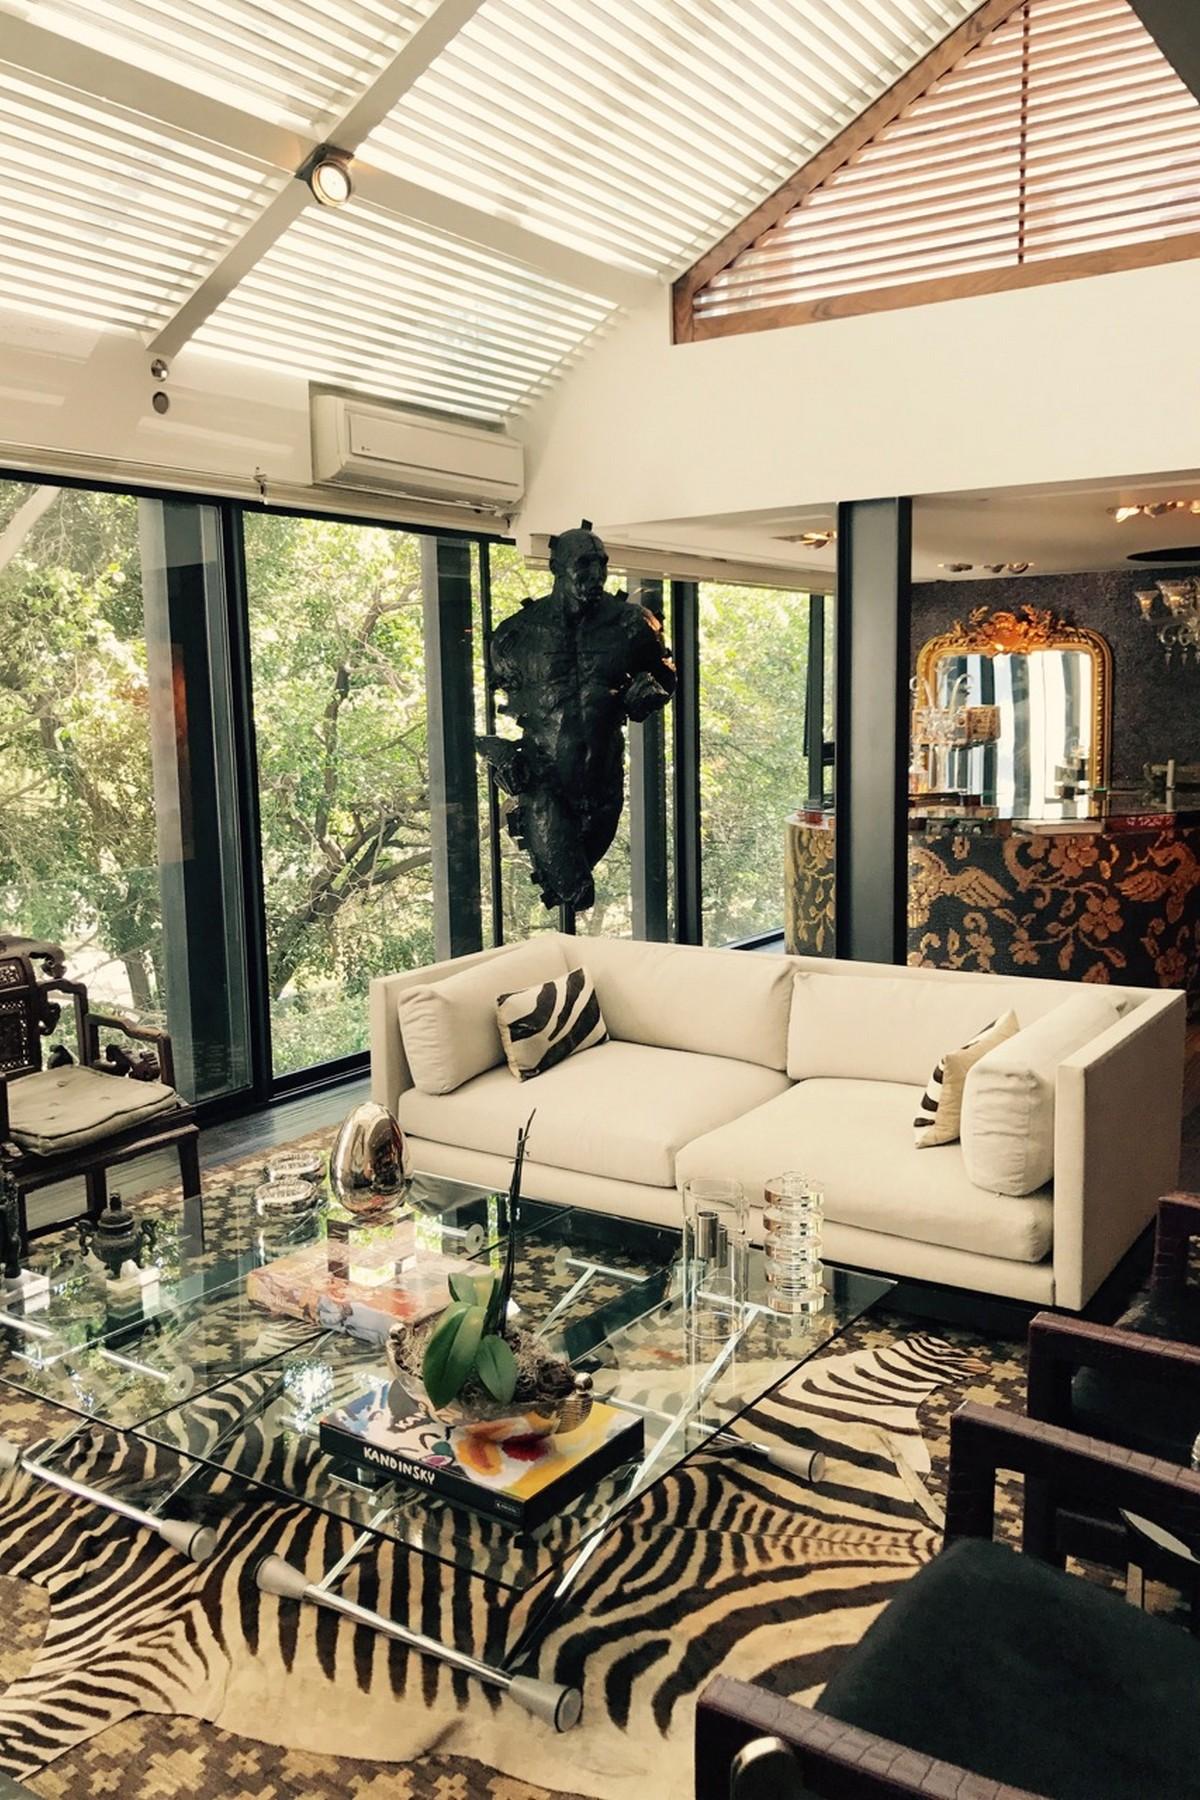 Additional photo for property listing at Pent House en Parque Li Luis G. Urbina 120 Int. 3 Chapultepec Polanco Federal District, Mexico Df 11000 México